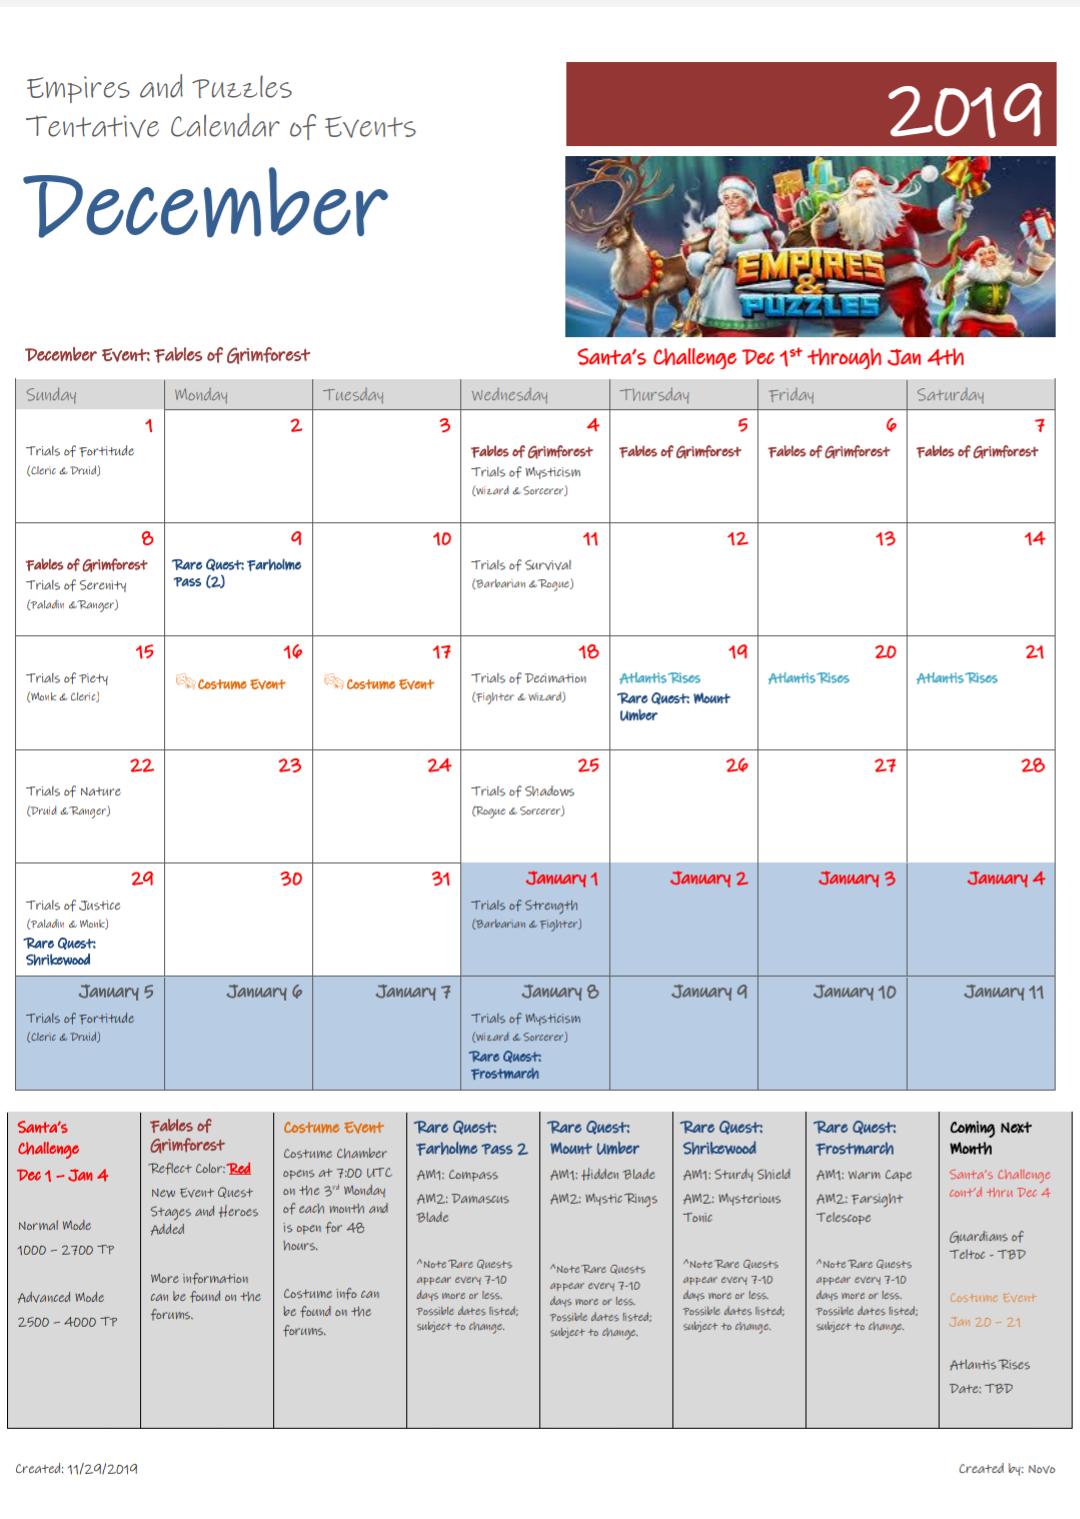 December 2019 Calendar Of Events : Empiresandpuzzles inside Calendar Empires And Puzzles